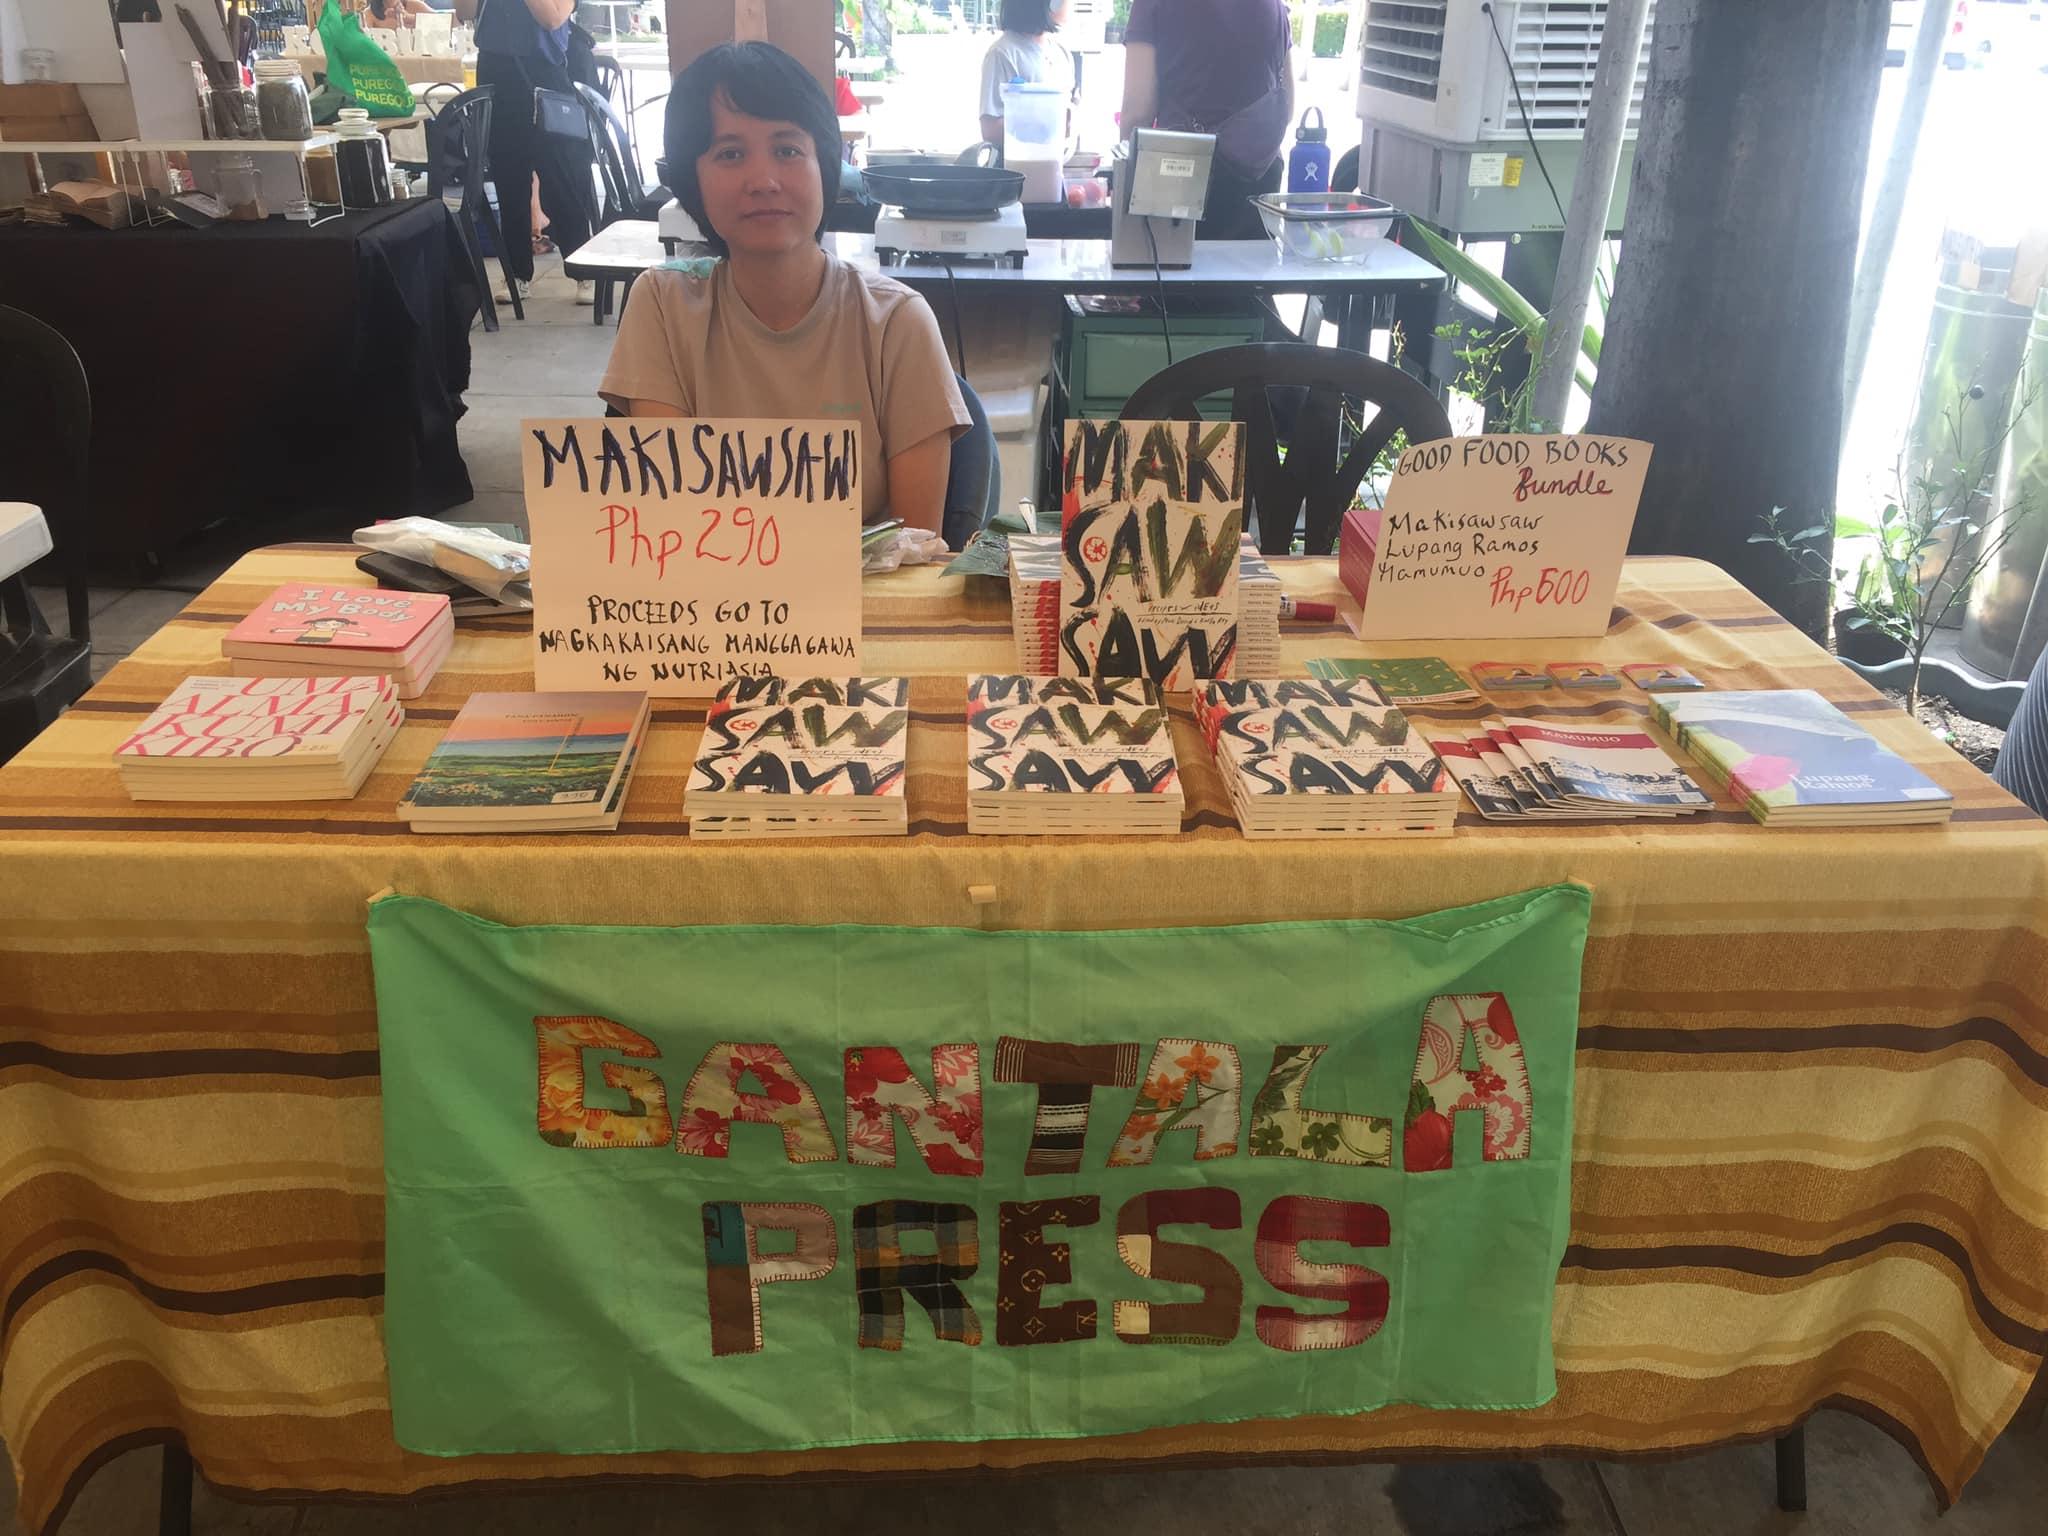 SALE. Gantala Press is stationed at Good Food Sundays to sell 'Makisawsaw' and other published works. Photo courtesy of Gantala Press